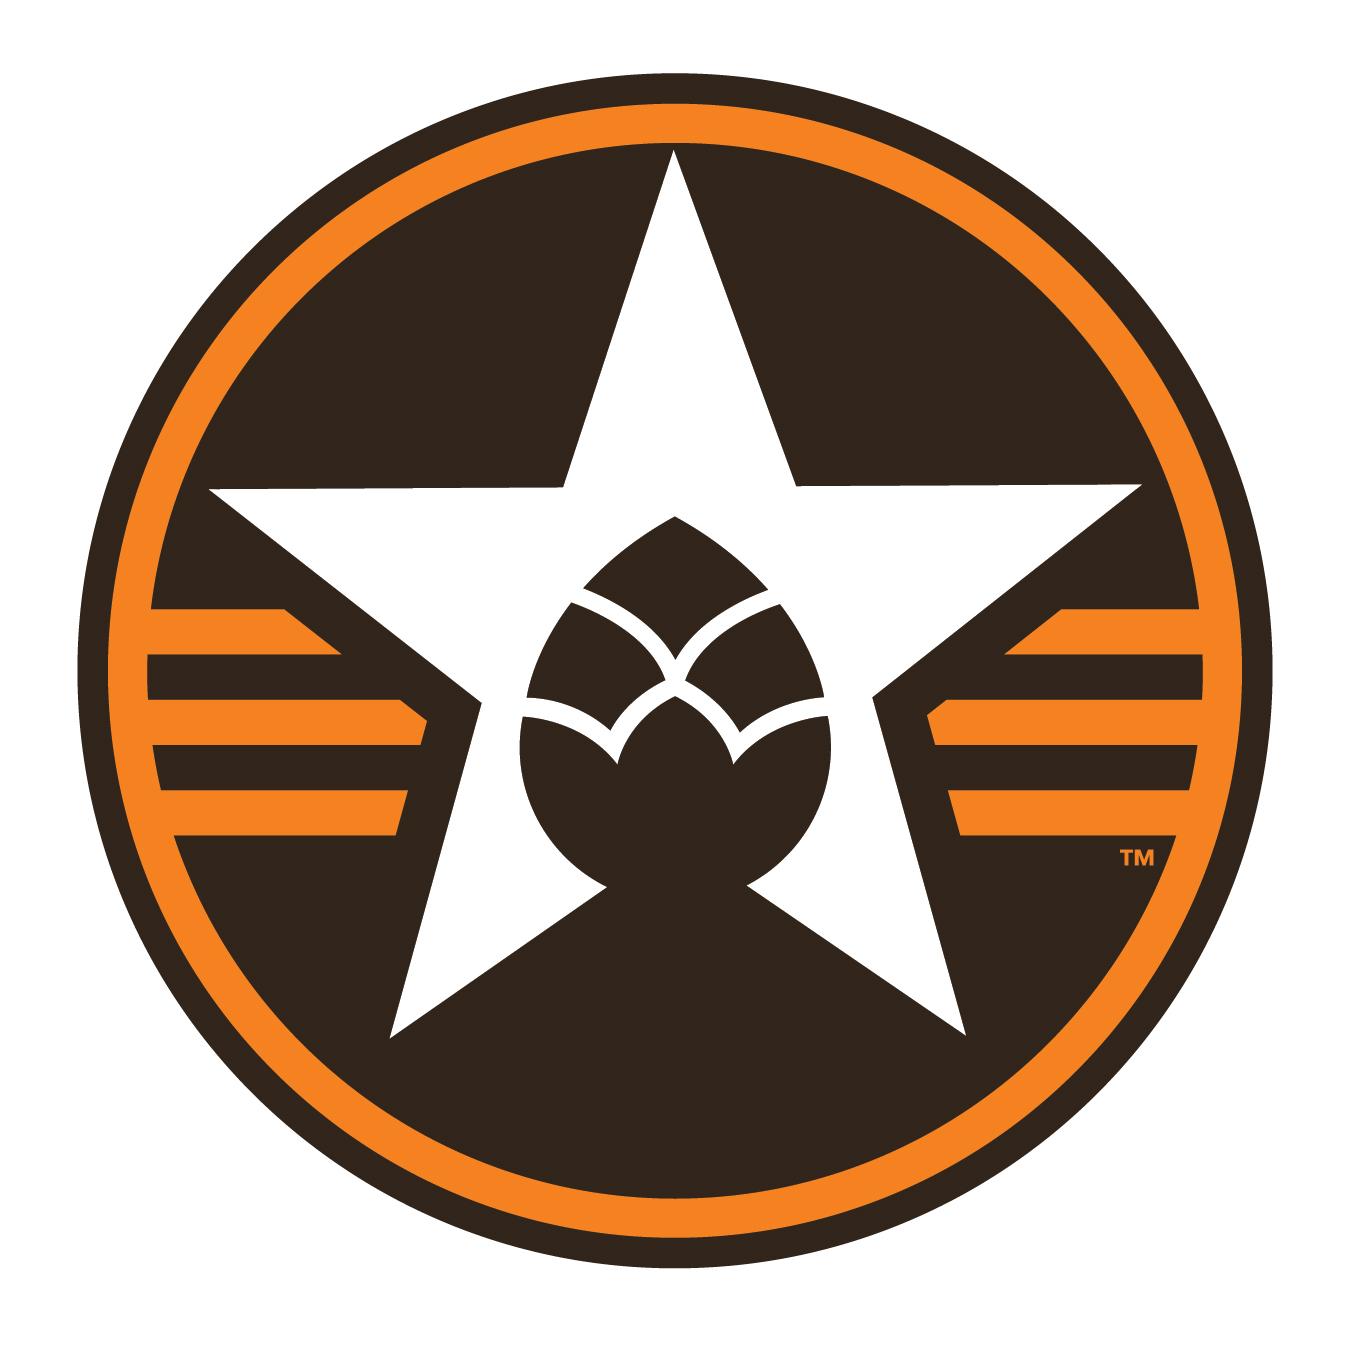 AAW_Assets_Hop Star ÔÇô Standard.jpg